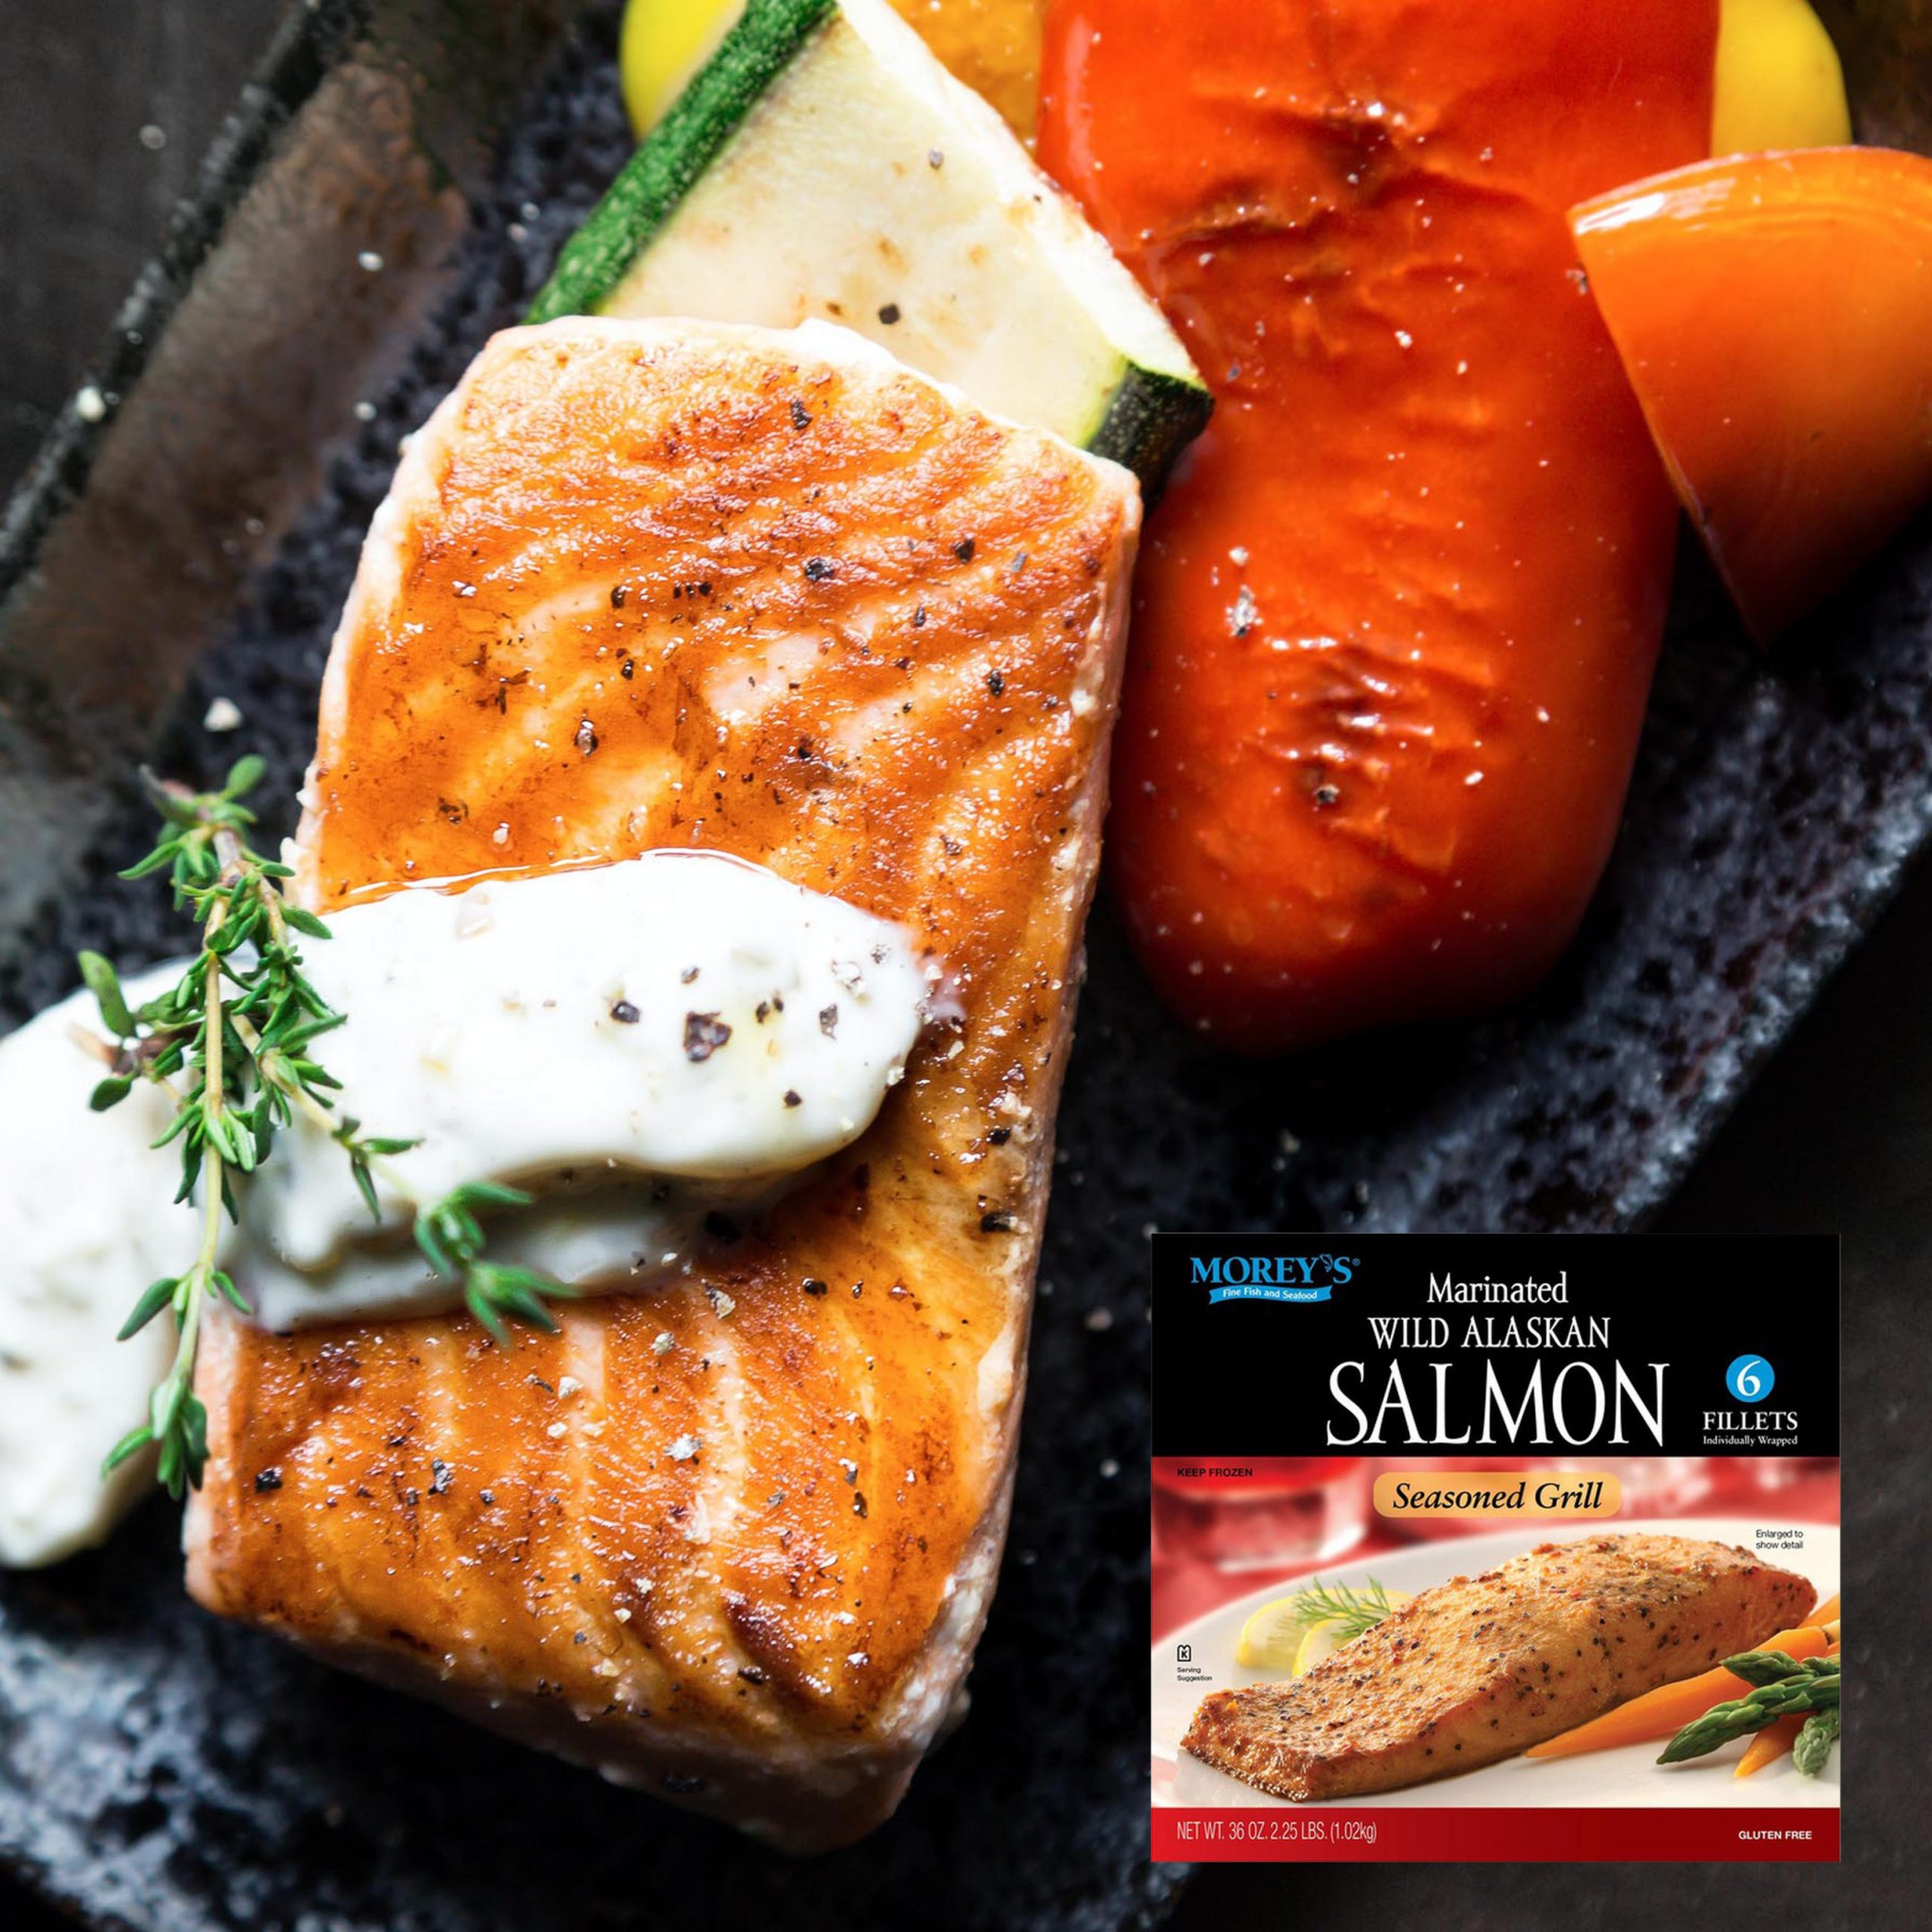 Moreys-Wild-Alaskan-Salmon-Feature-scaled-1.jpg